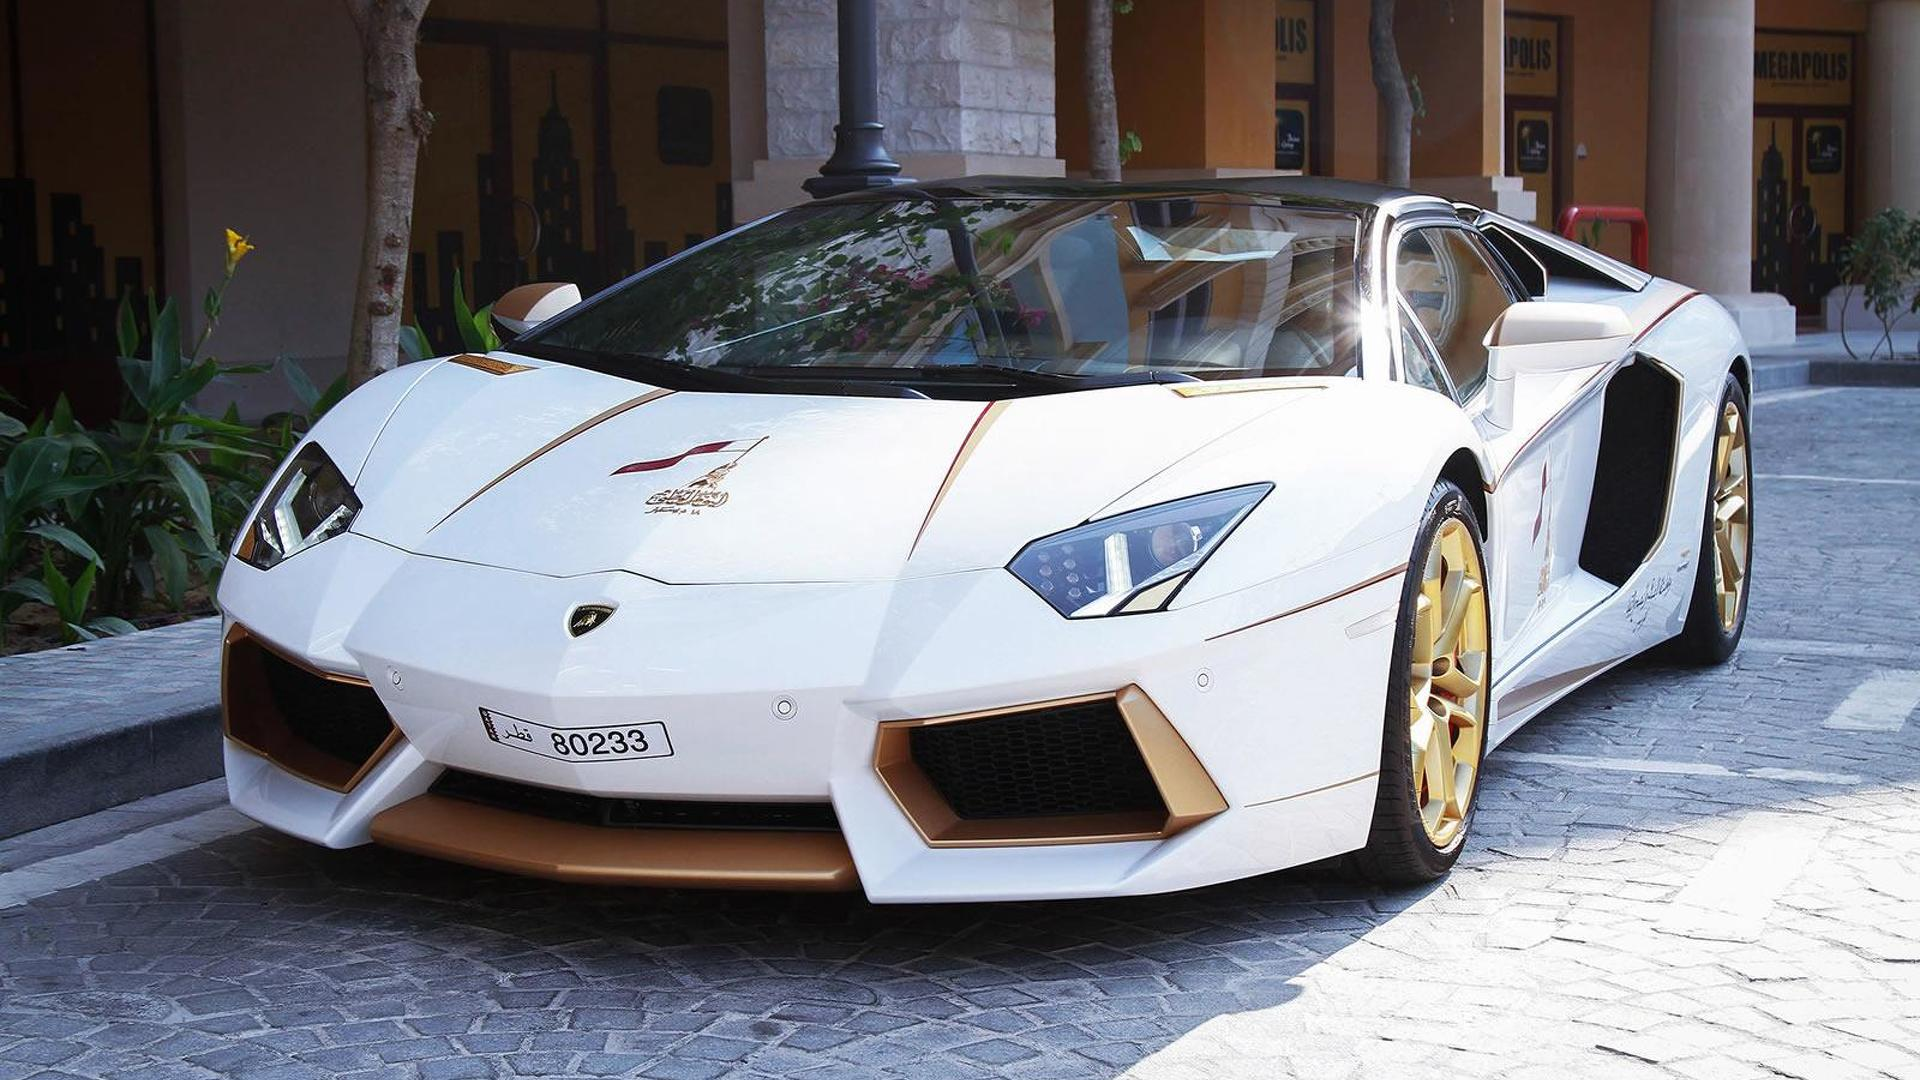 Lamborghini Aventador Gold >> Lamborghini Aventador Receives Subtle Gold Treatment From Maatouk